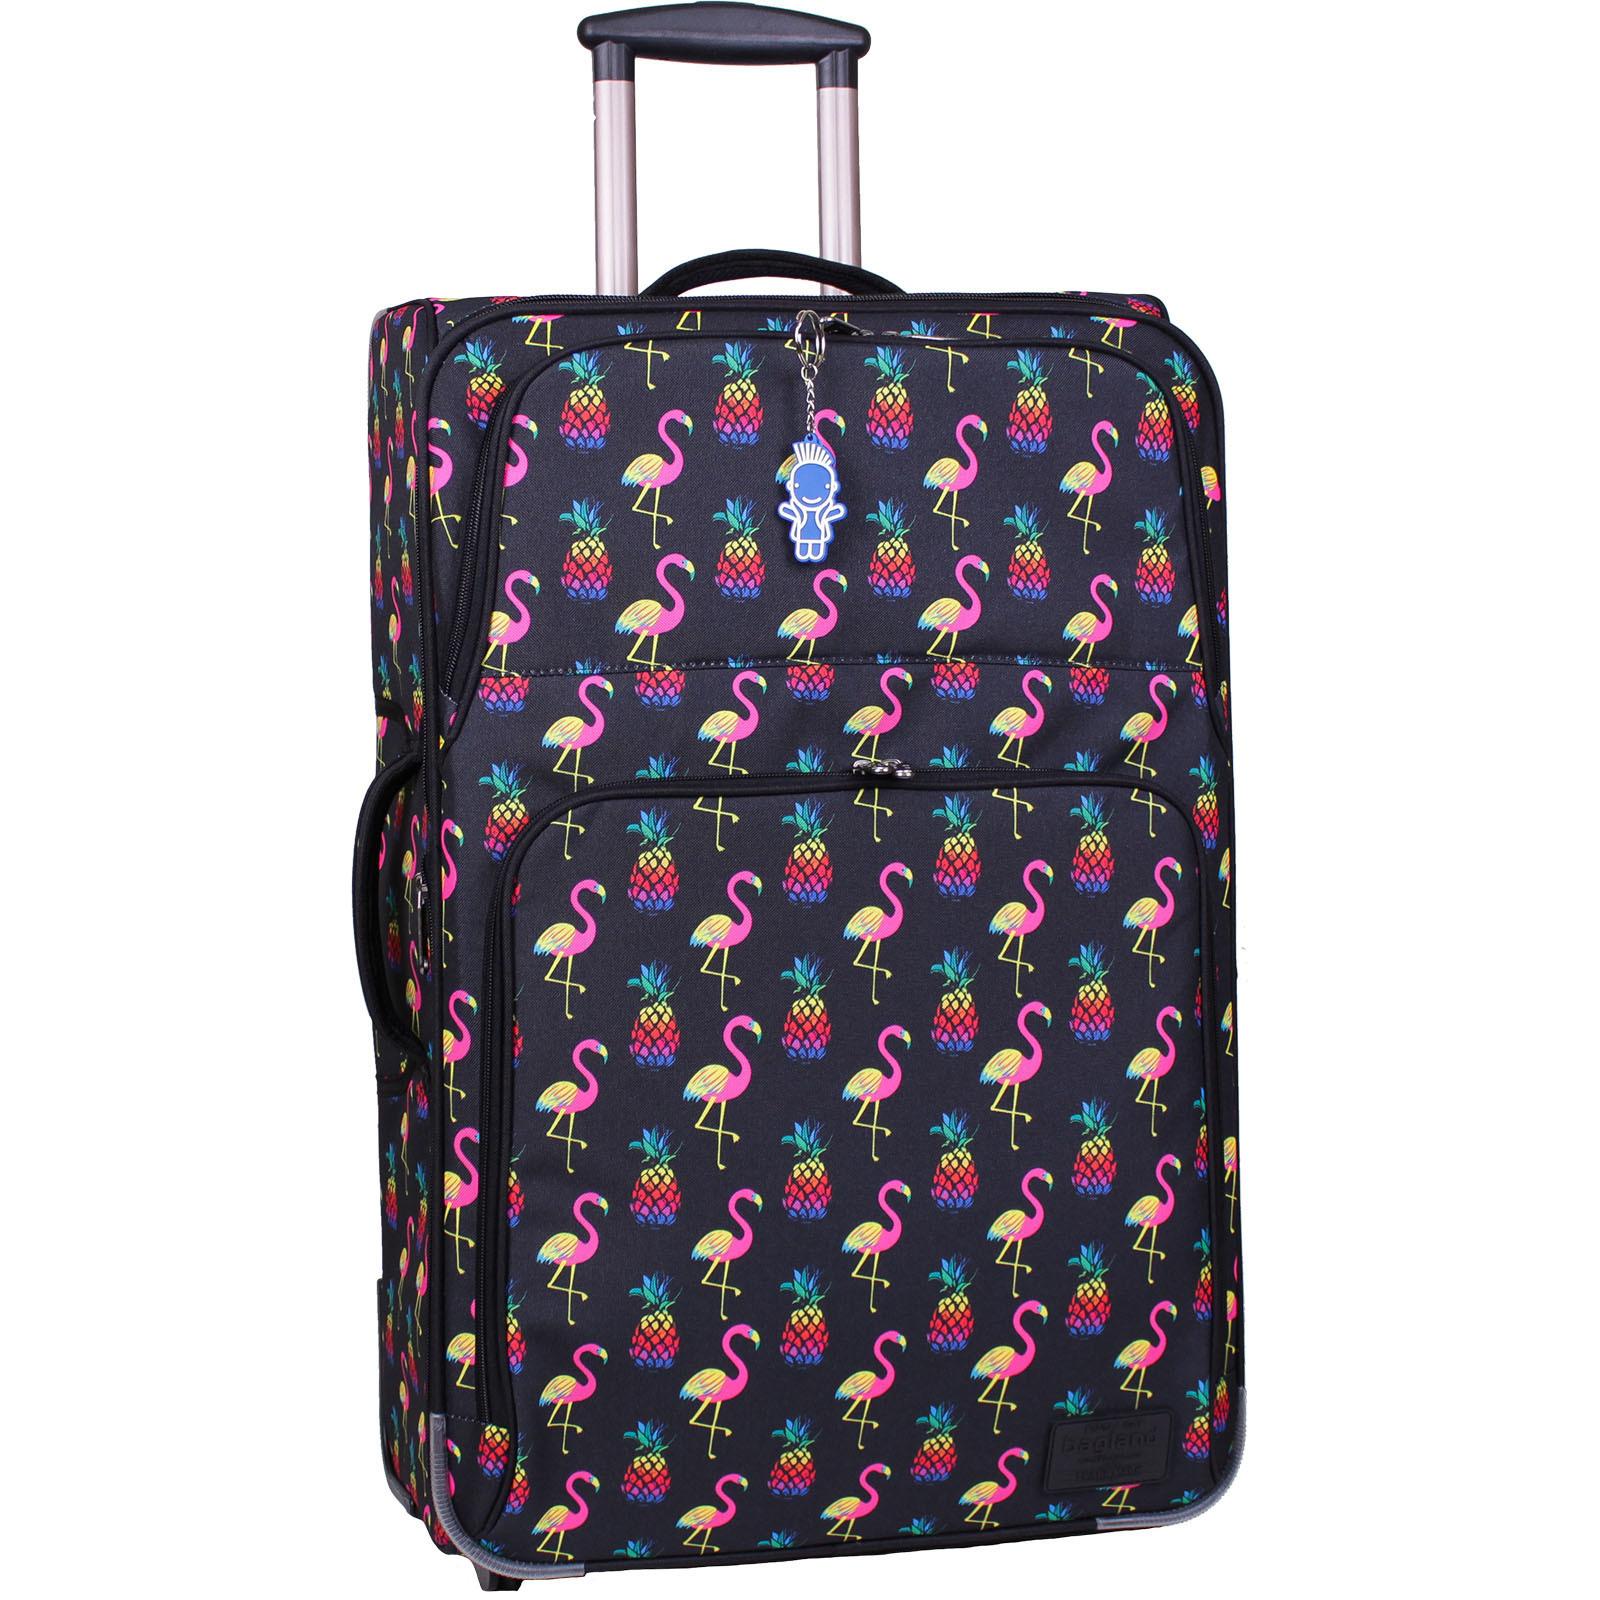 Дорожные чемоданы Чемодан Bagland Леон большой дизайн 70 л. сублімація 361 (0037666274) IMG_6859-1600.jpg